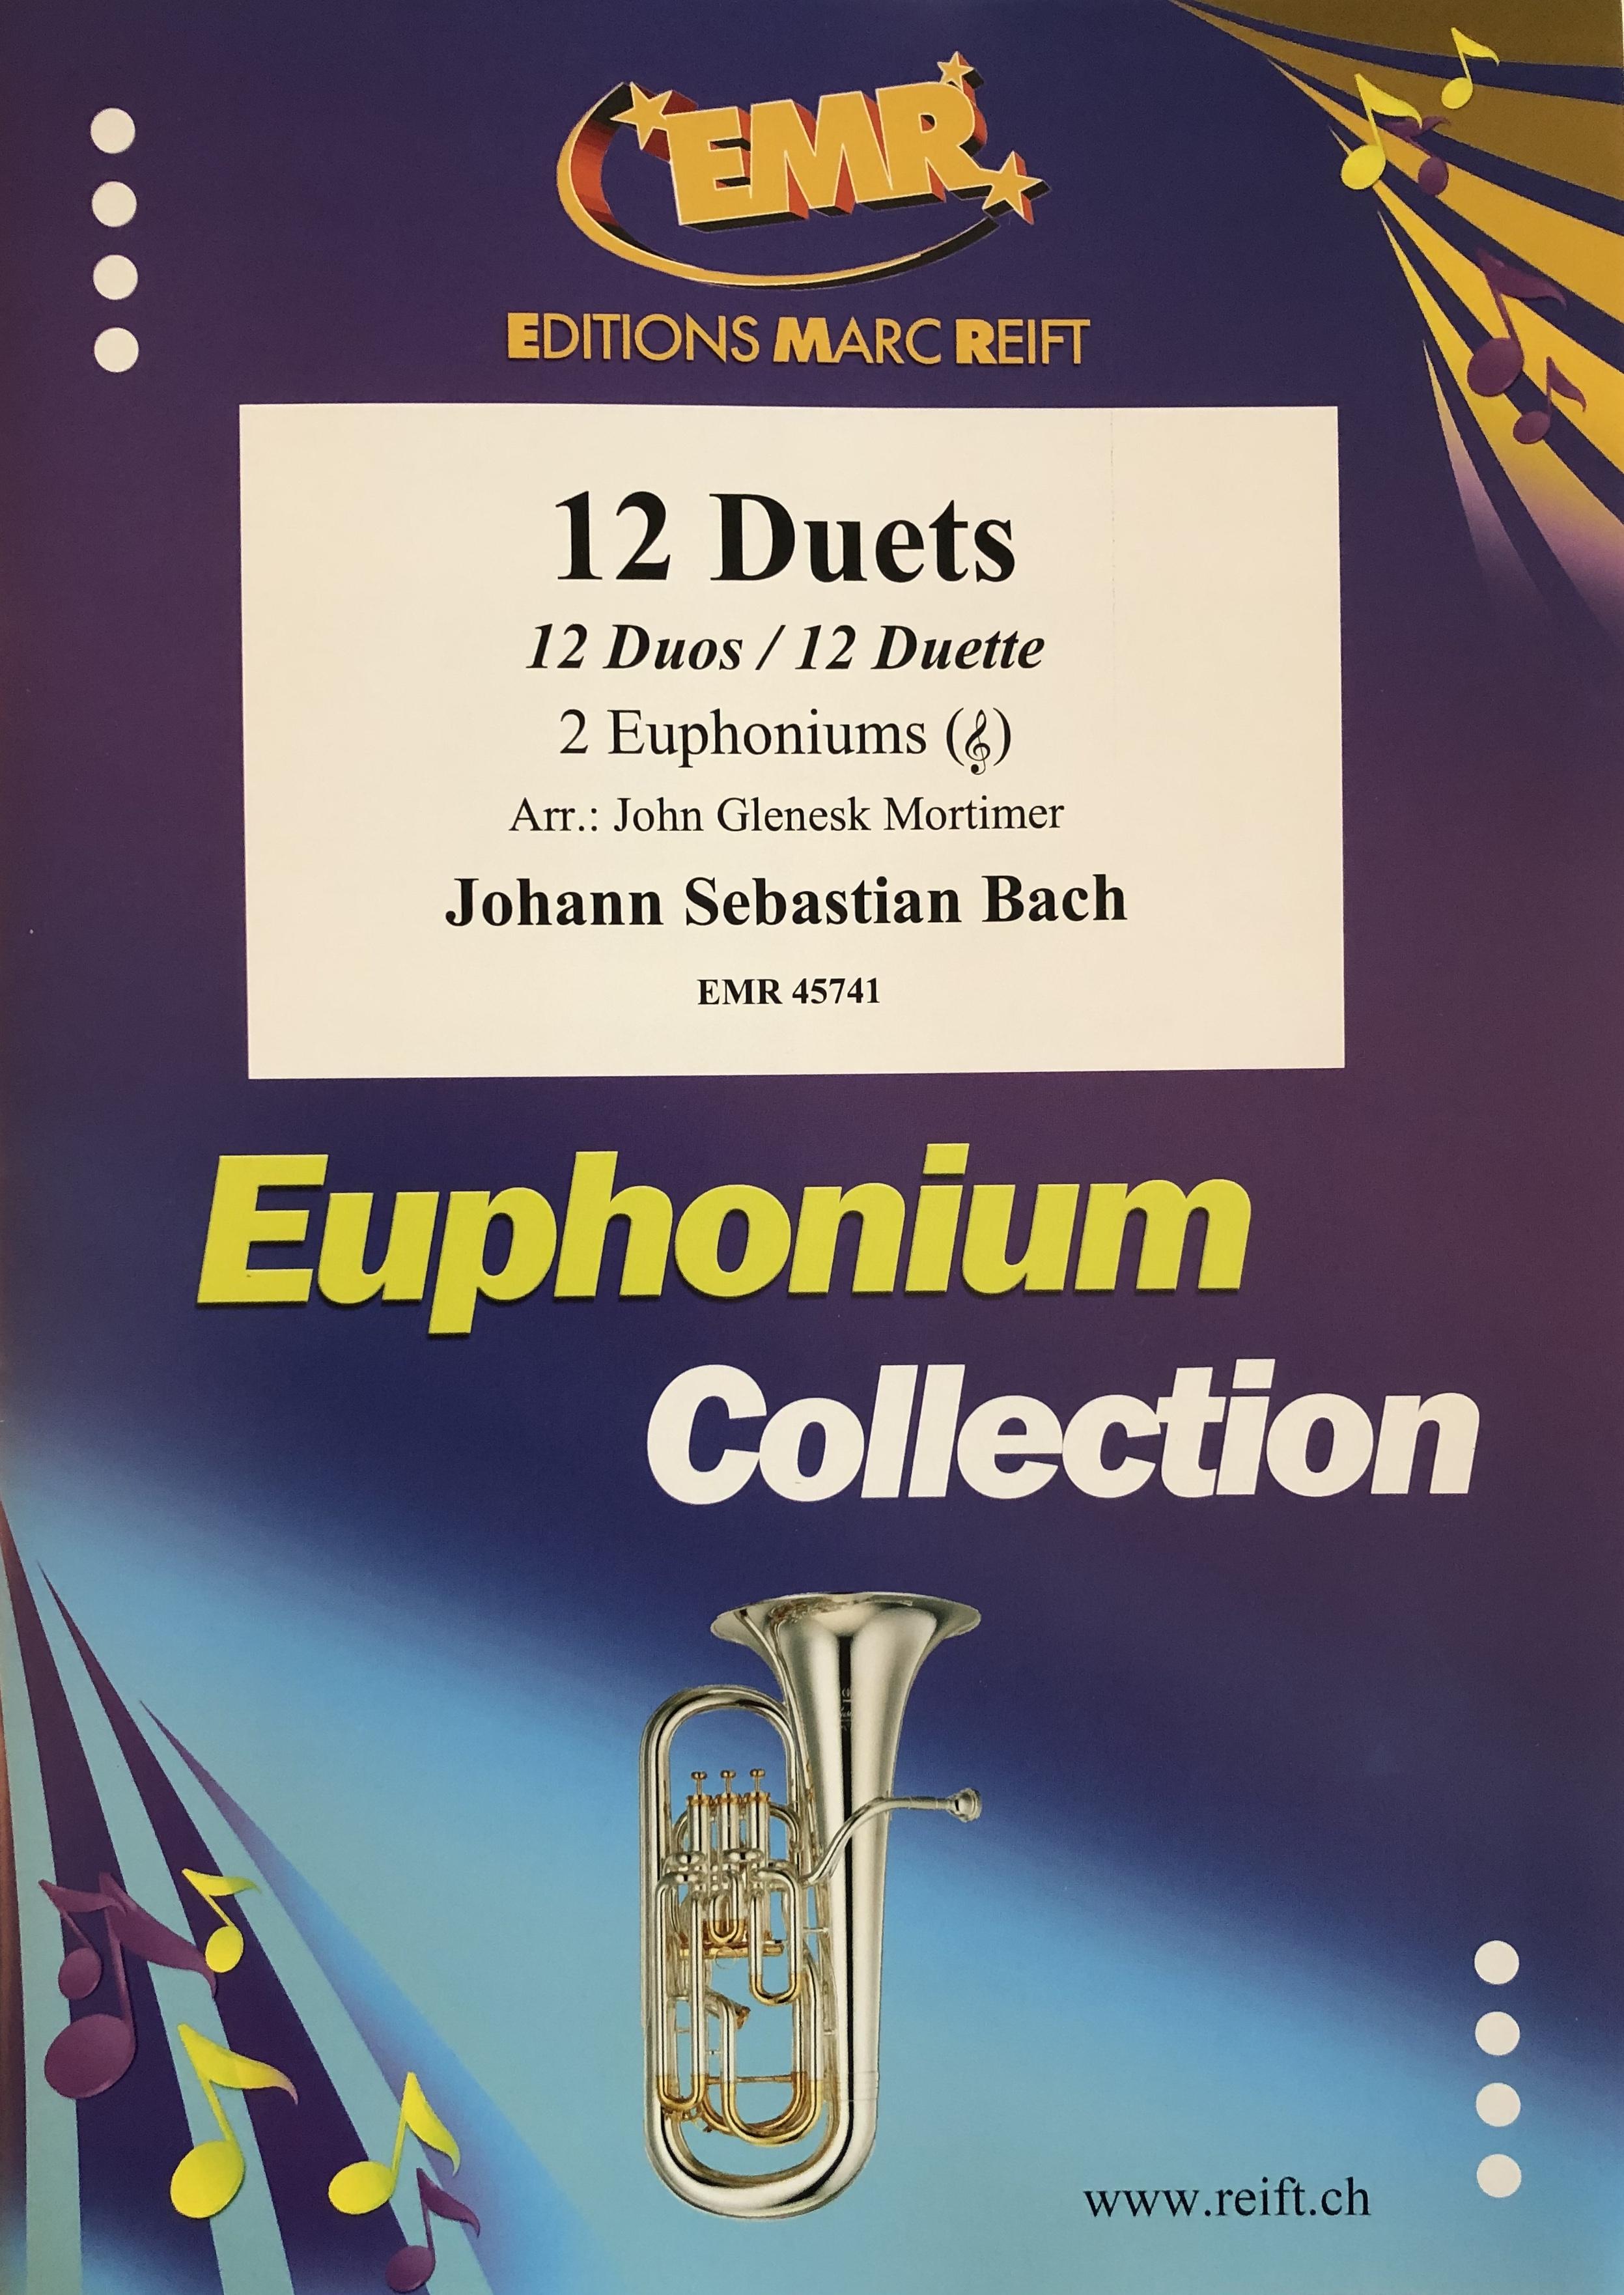 12 Duets for 2 Euphoniums (treble clef) - JS Bach Arr John Mortimer